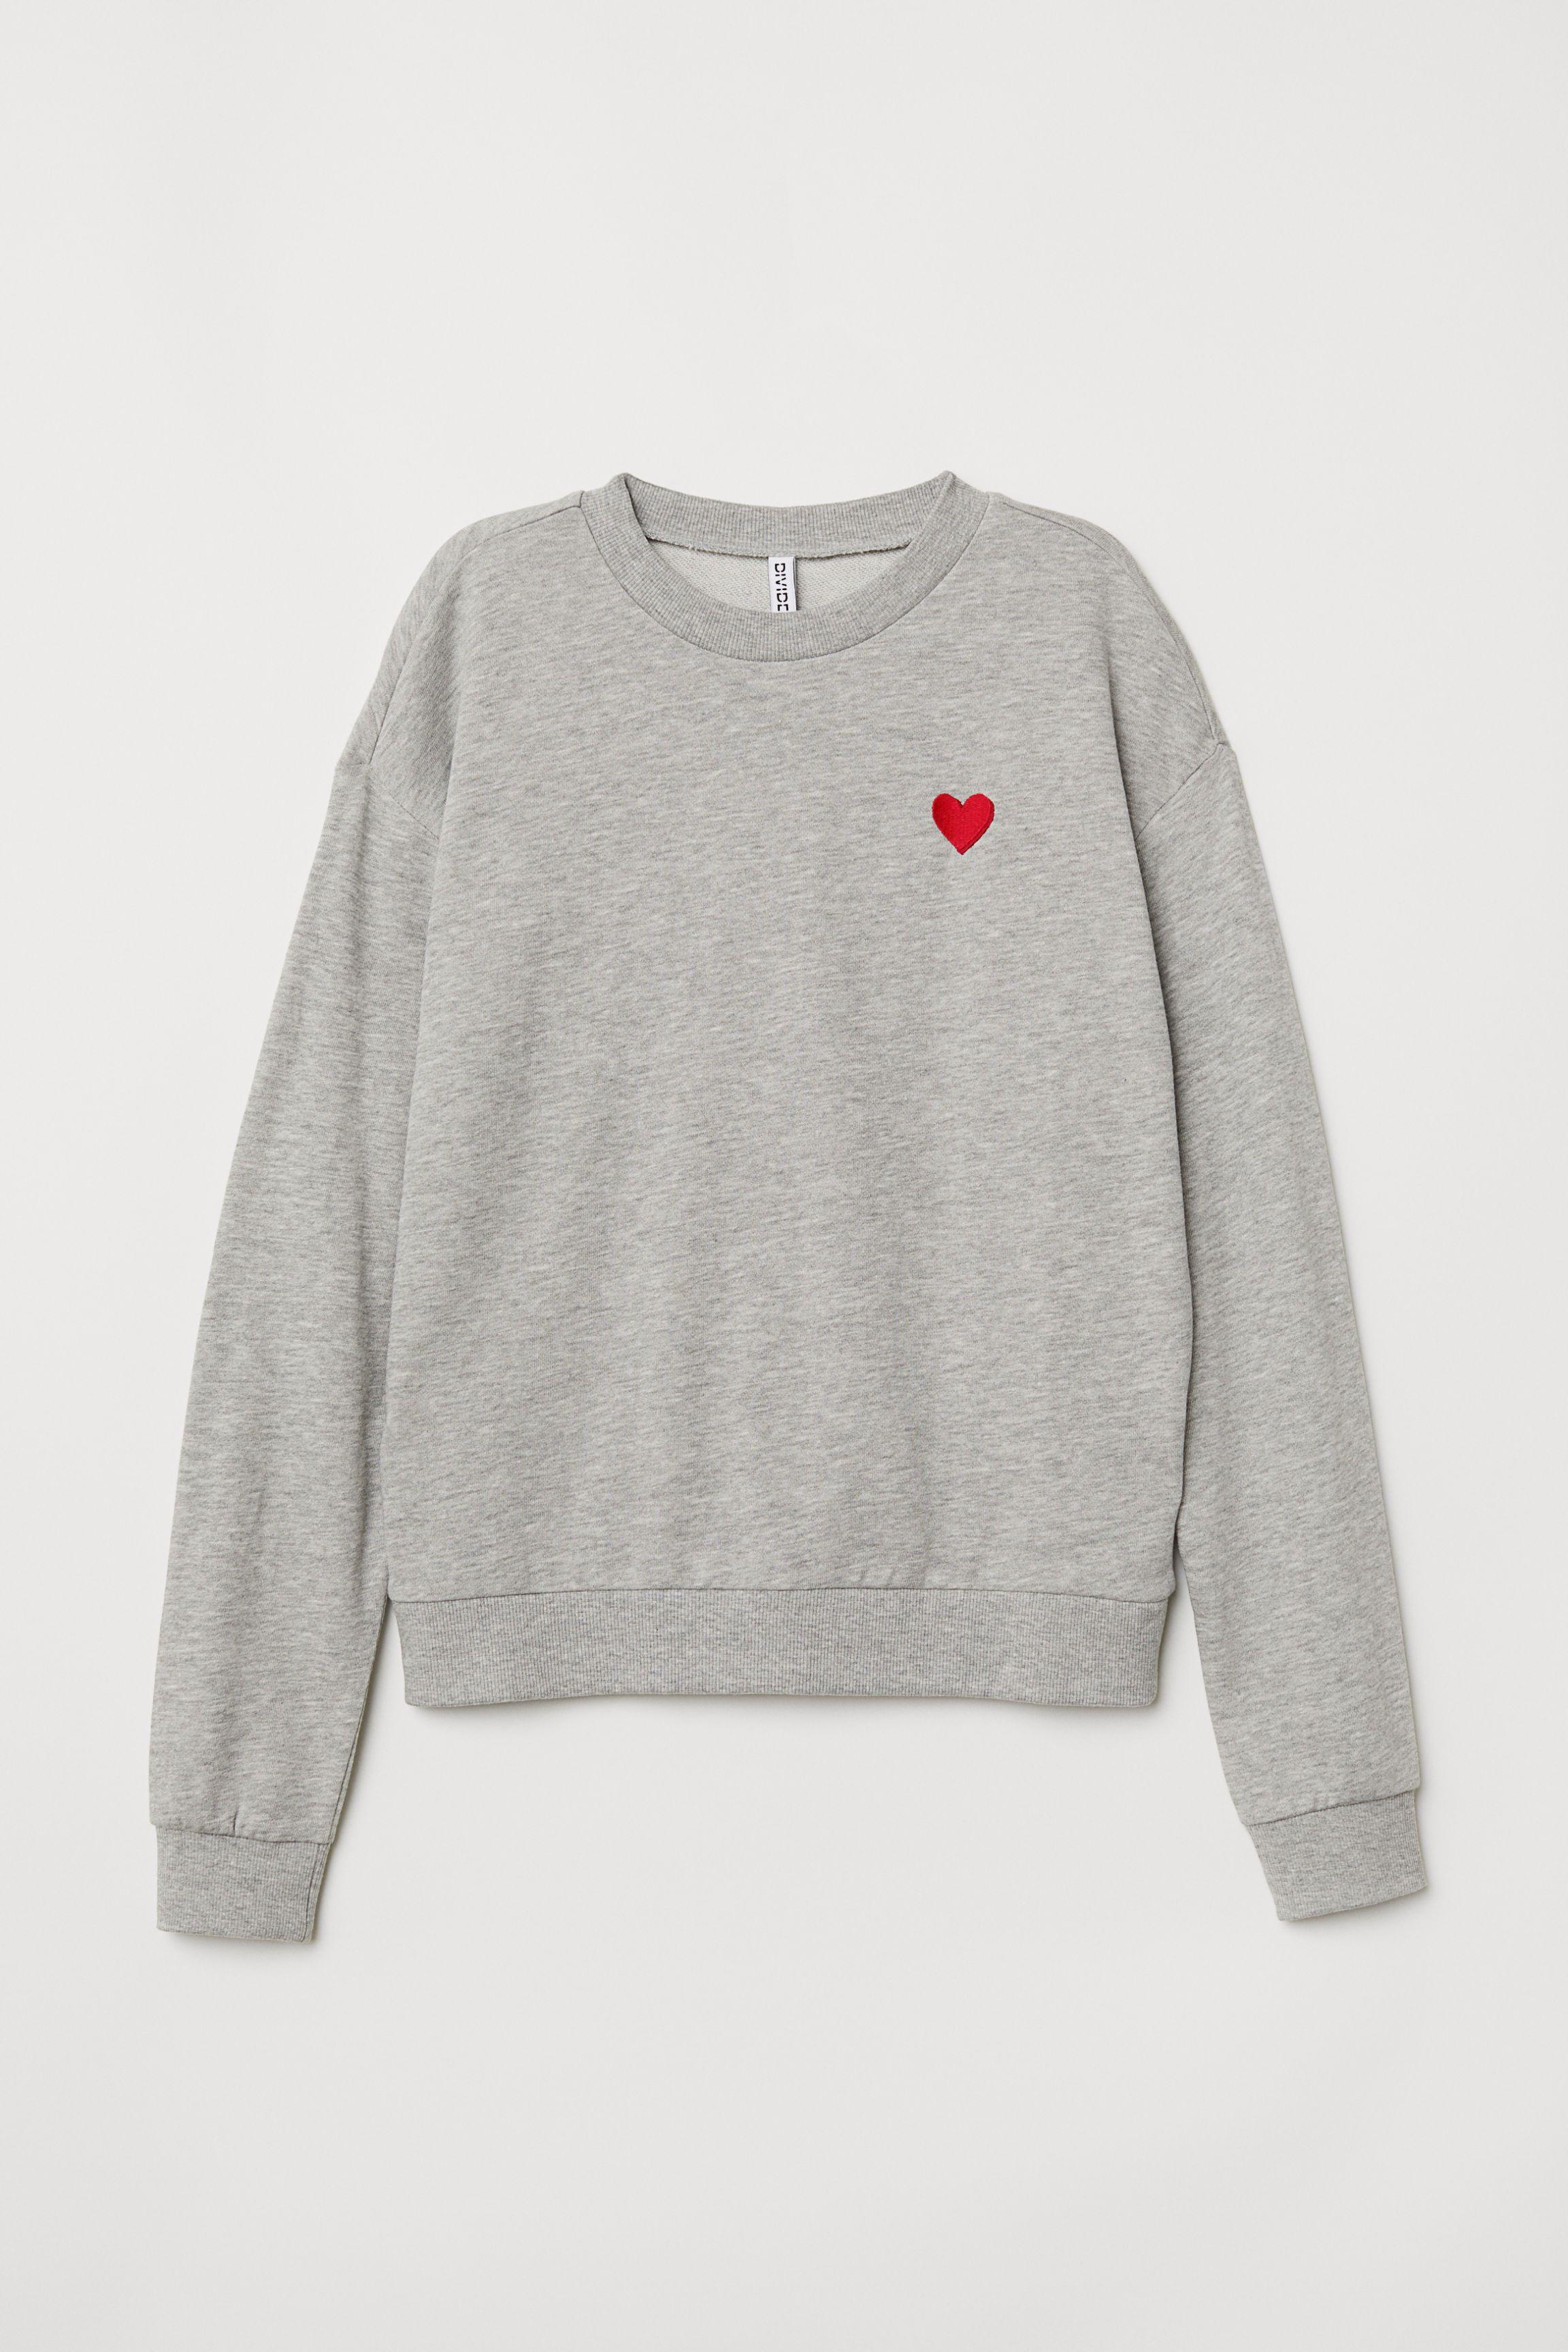 9a07dcf6 Sweatshirt